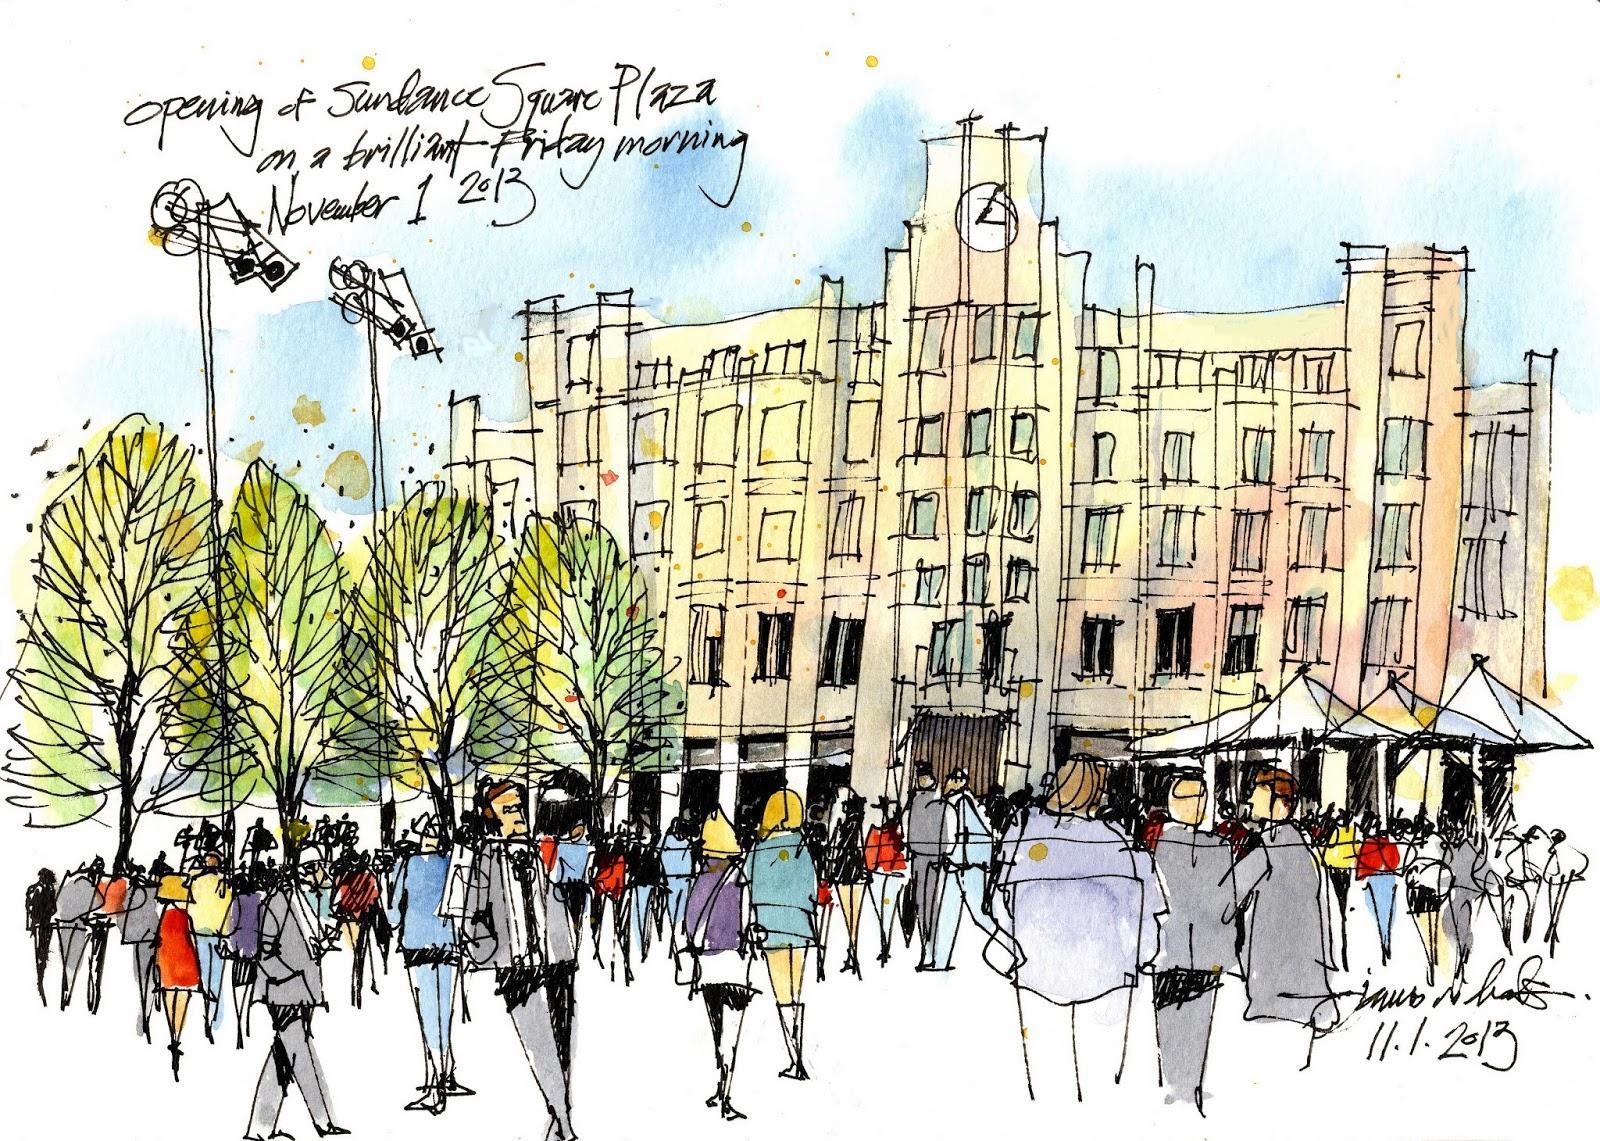 sundance square plaza opening_Jim Richards Sketch